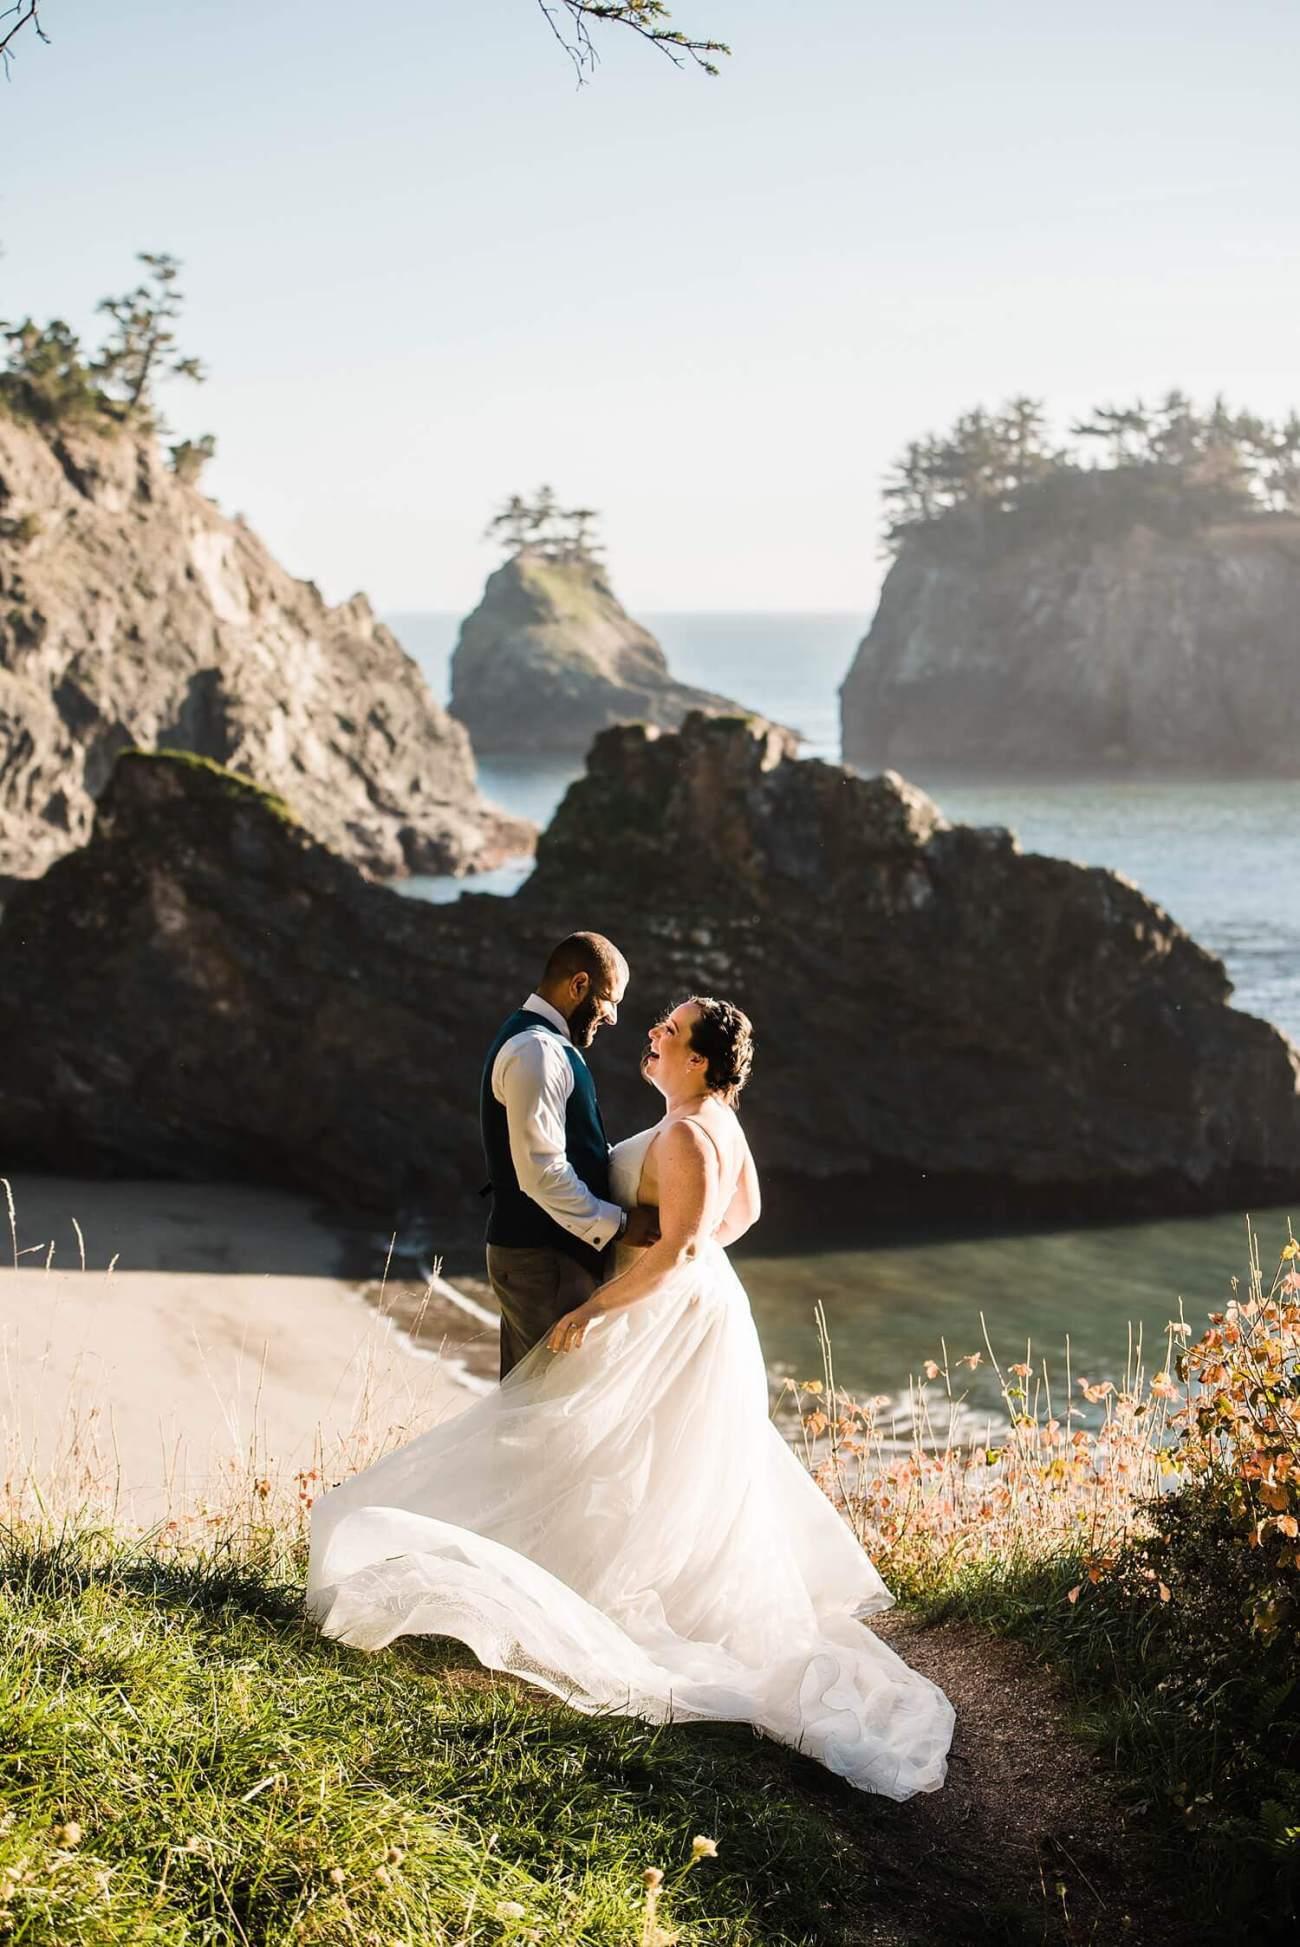 Oregon Coast,adventure elopement photographer,beach elopement,beach wedding,elopement,elopement photographer,intimate wedding,oregon coast elopement,oregon wedding,pacific northwest wedding,sam starns,